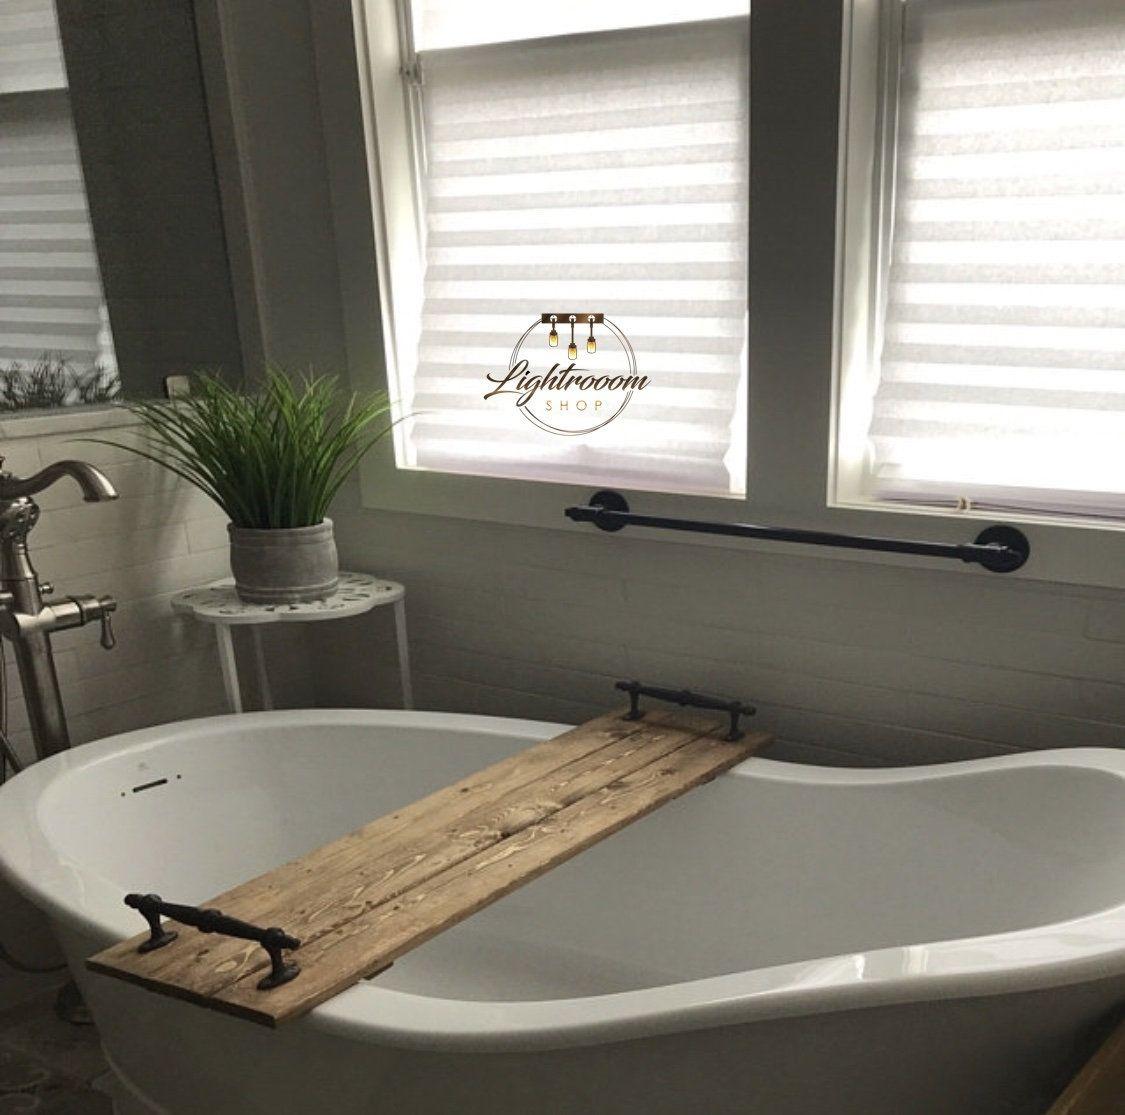 Photo of Towel Holder, Industrial, Modern, Bar Pipe Bathroom, Hardware, Towel Rack, Bathroom Towel Holder, Pipe Fixture, Farmhouse Decor, Unique,Gift